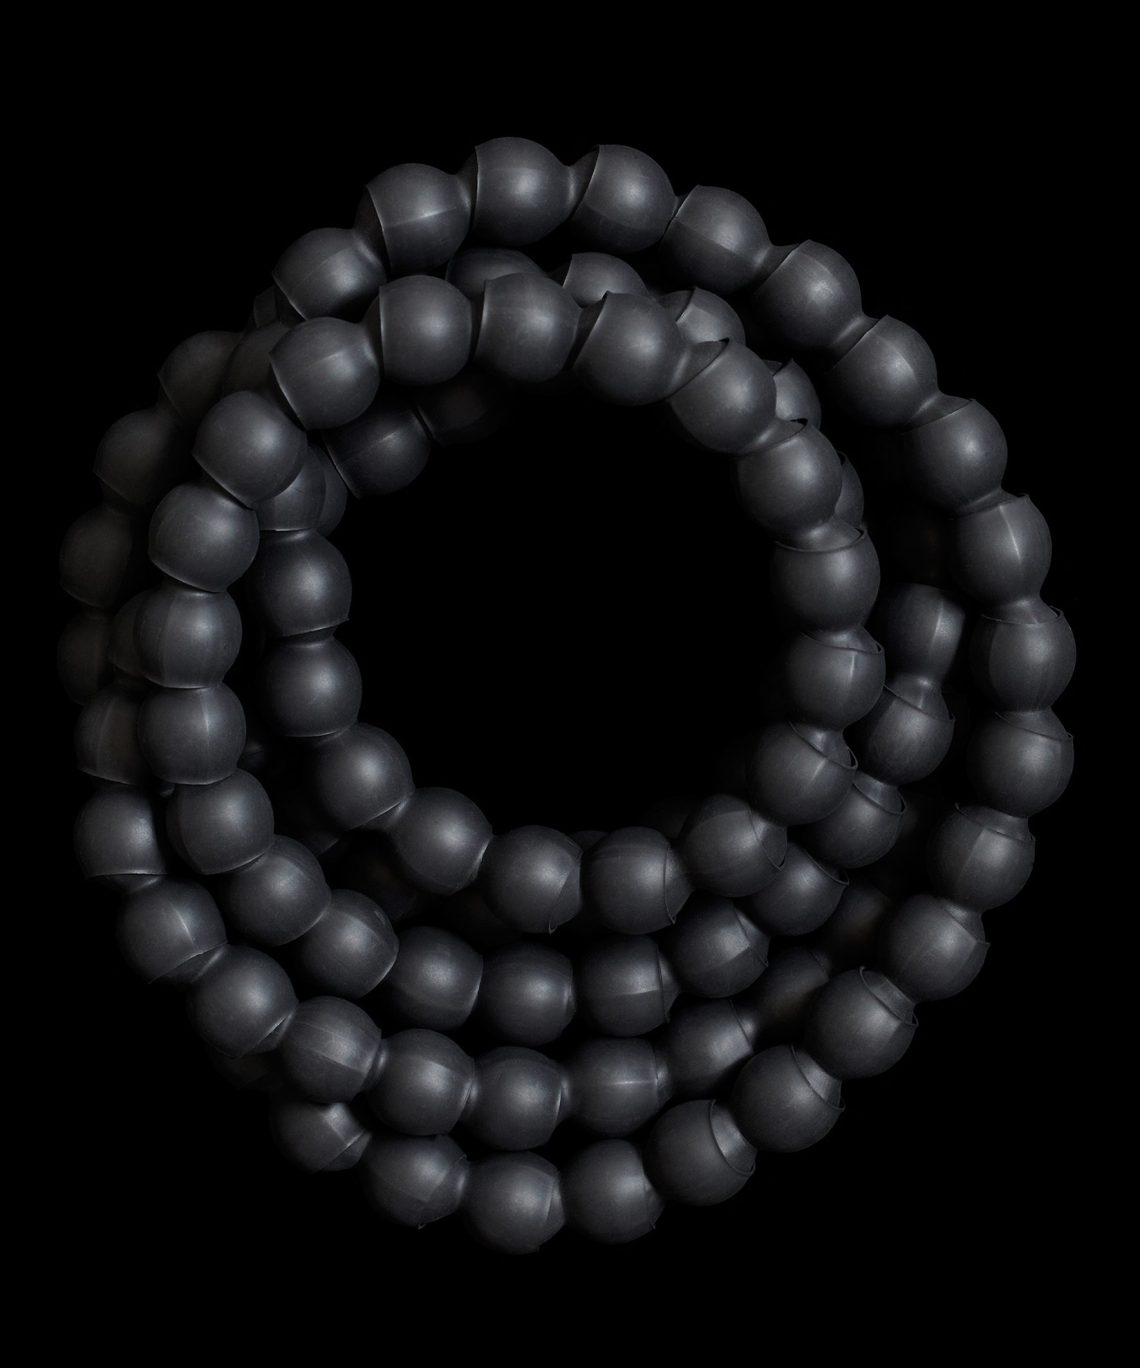 Susanne Klemm, Black, Caviar, halssieraad, 2010. Foto met dank aan Susanne Klemm©